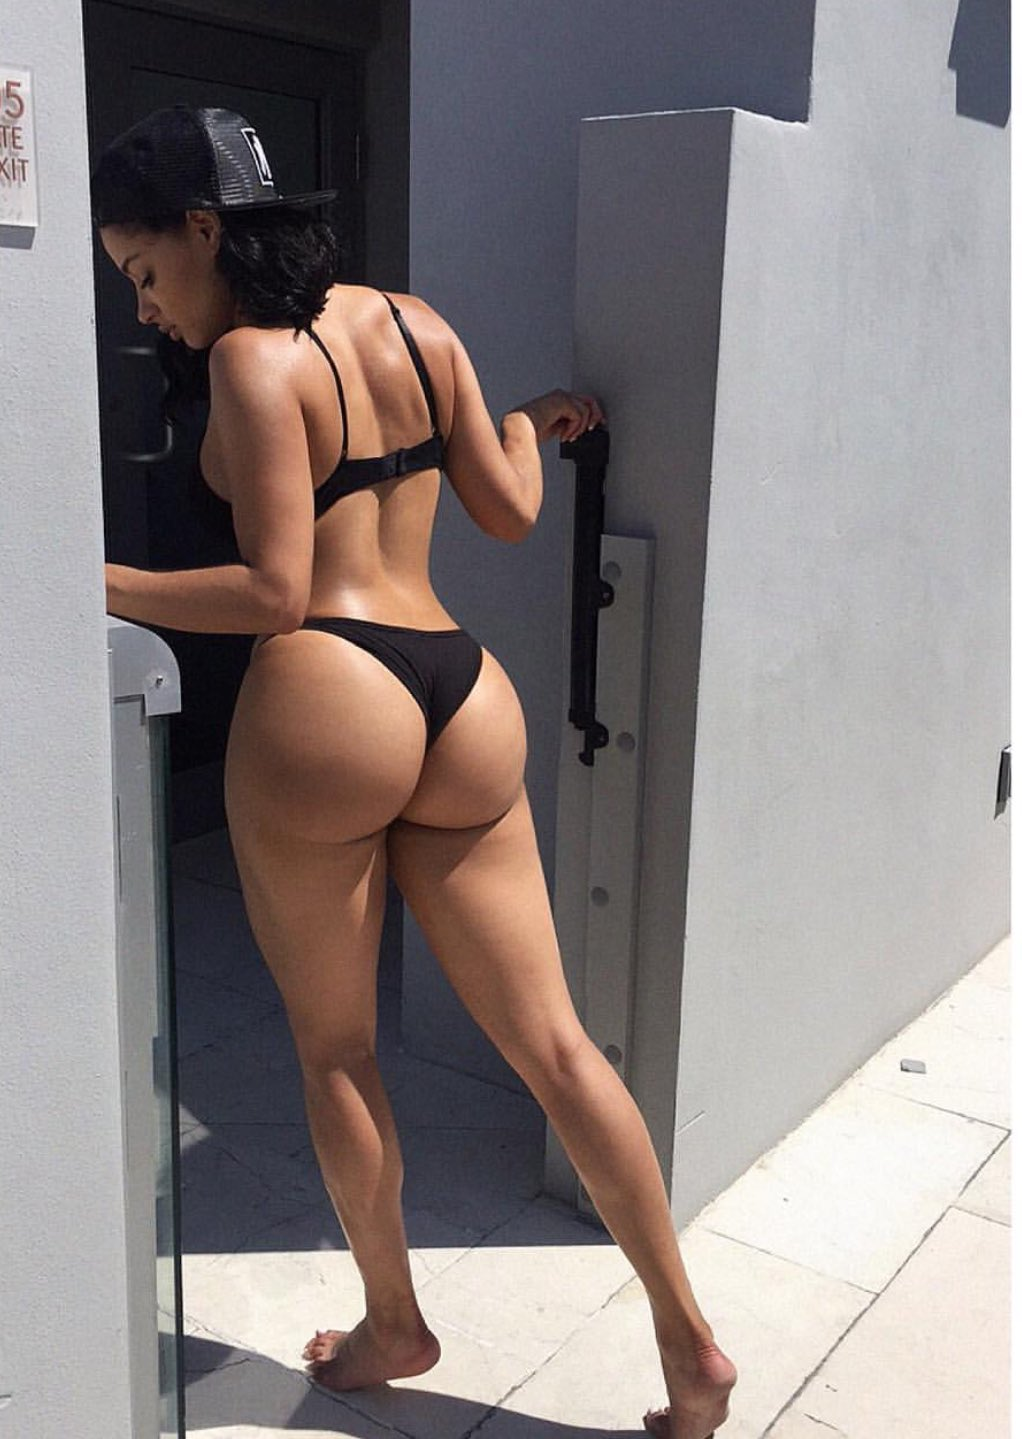 Ass Erica Mena nudes (84 photo), Pussy, Paparazzi, Instagram, bra 2020